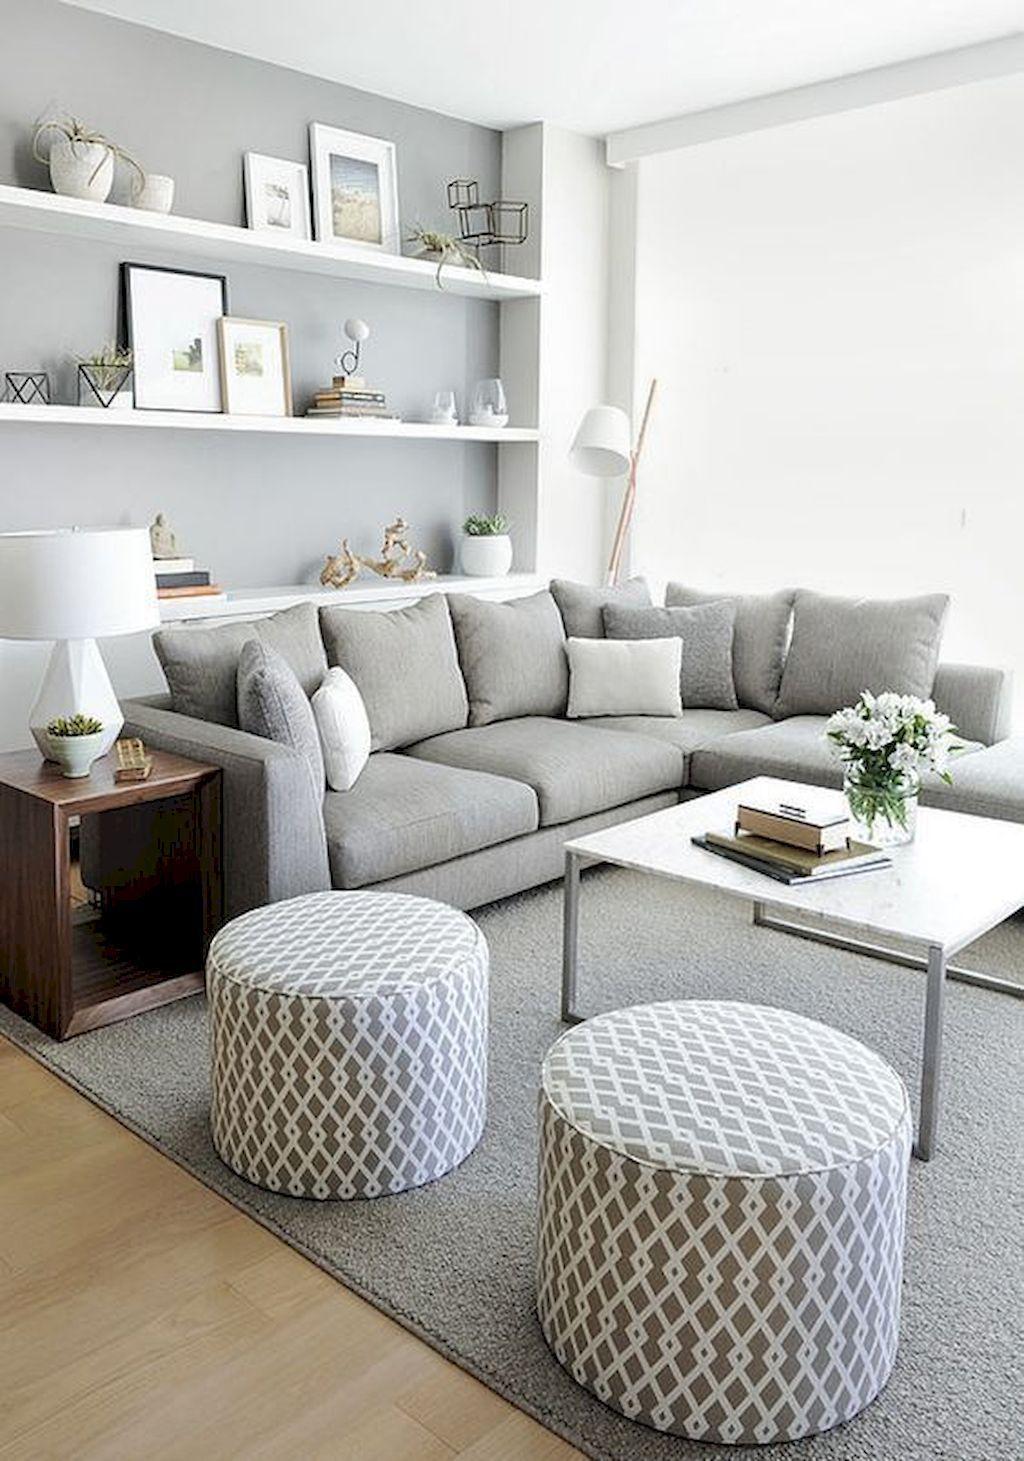 Home interior ideas for apartments cozy living room ideas for small apartments   cozy living rooms